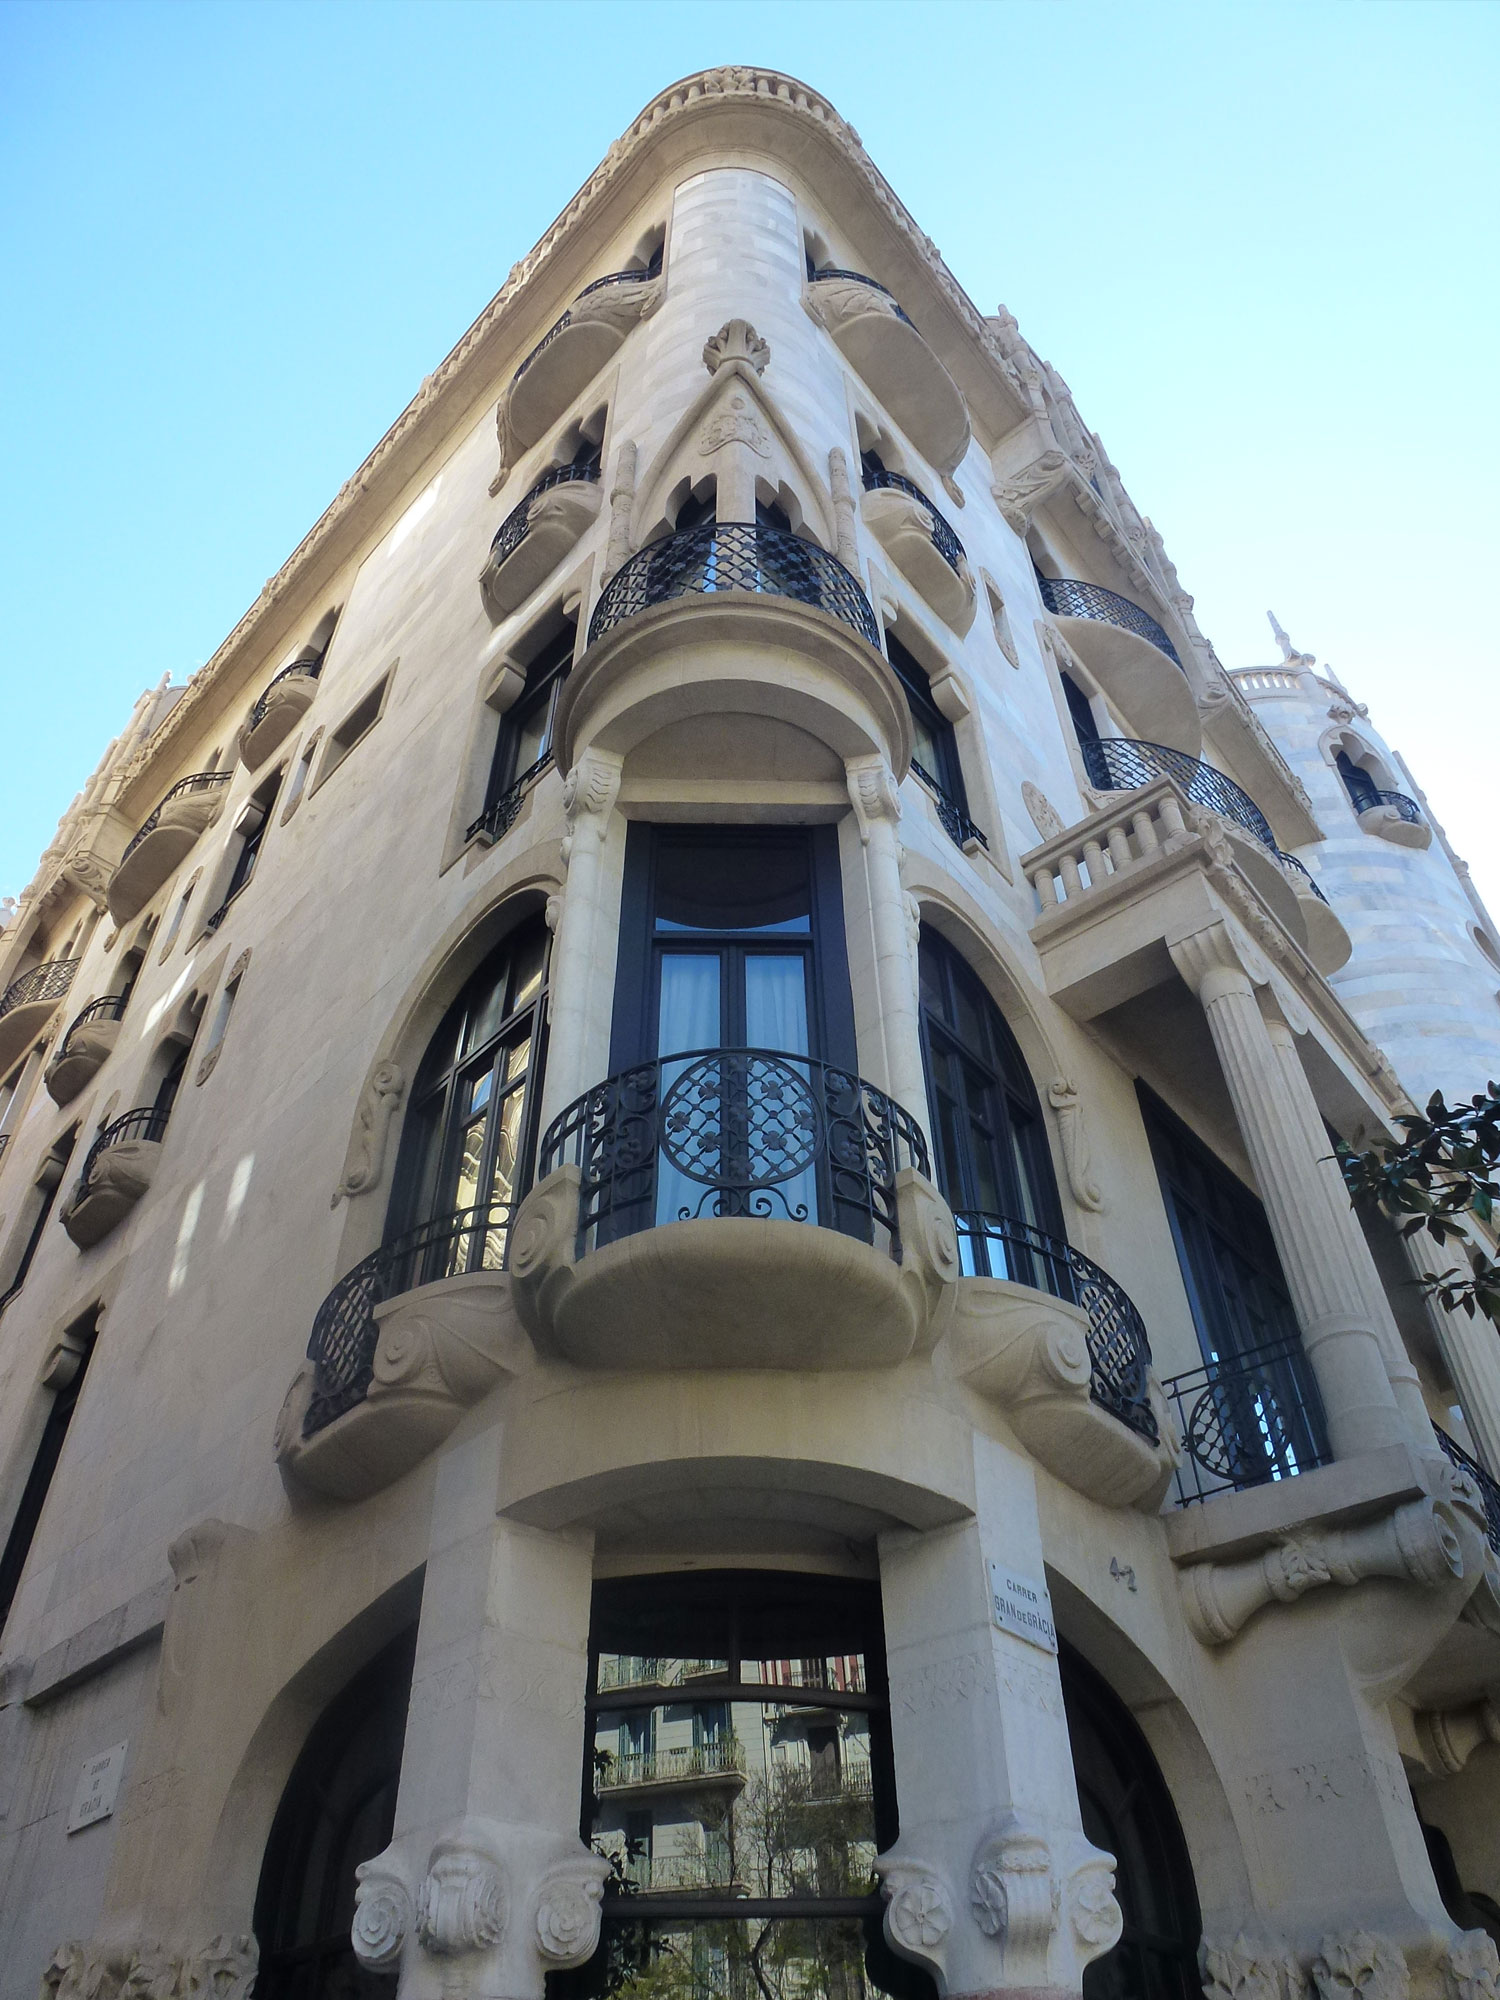 casa-fuster-thetasteofbarcelona-corner-tower-small